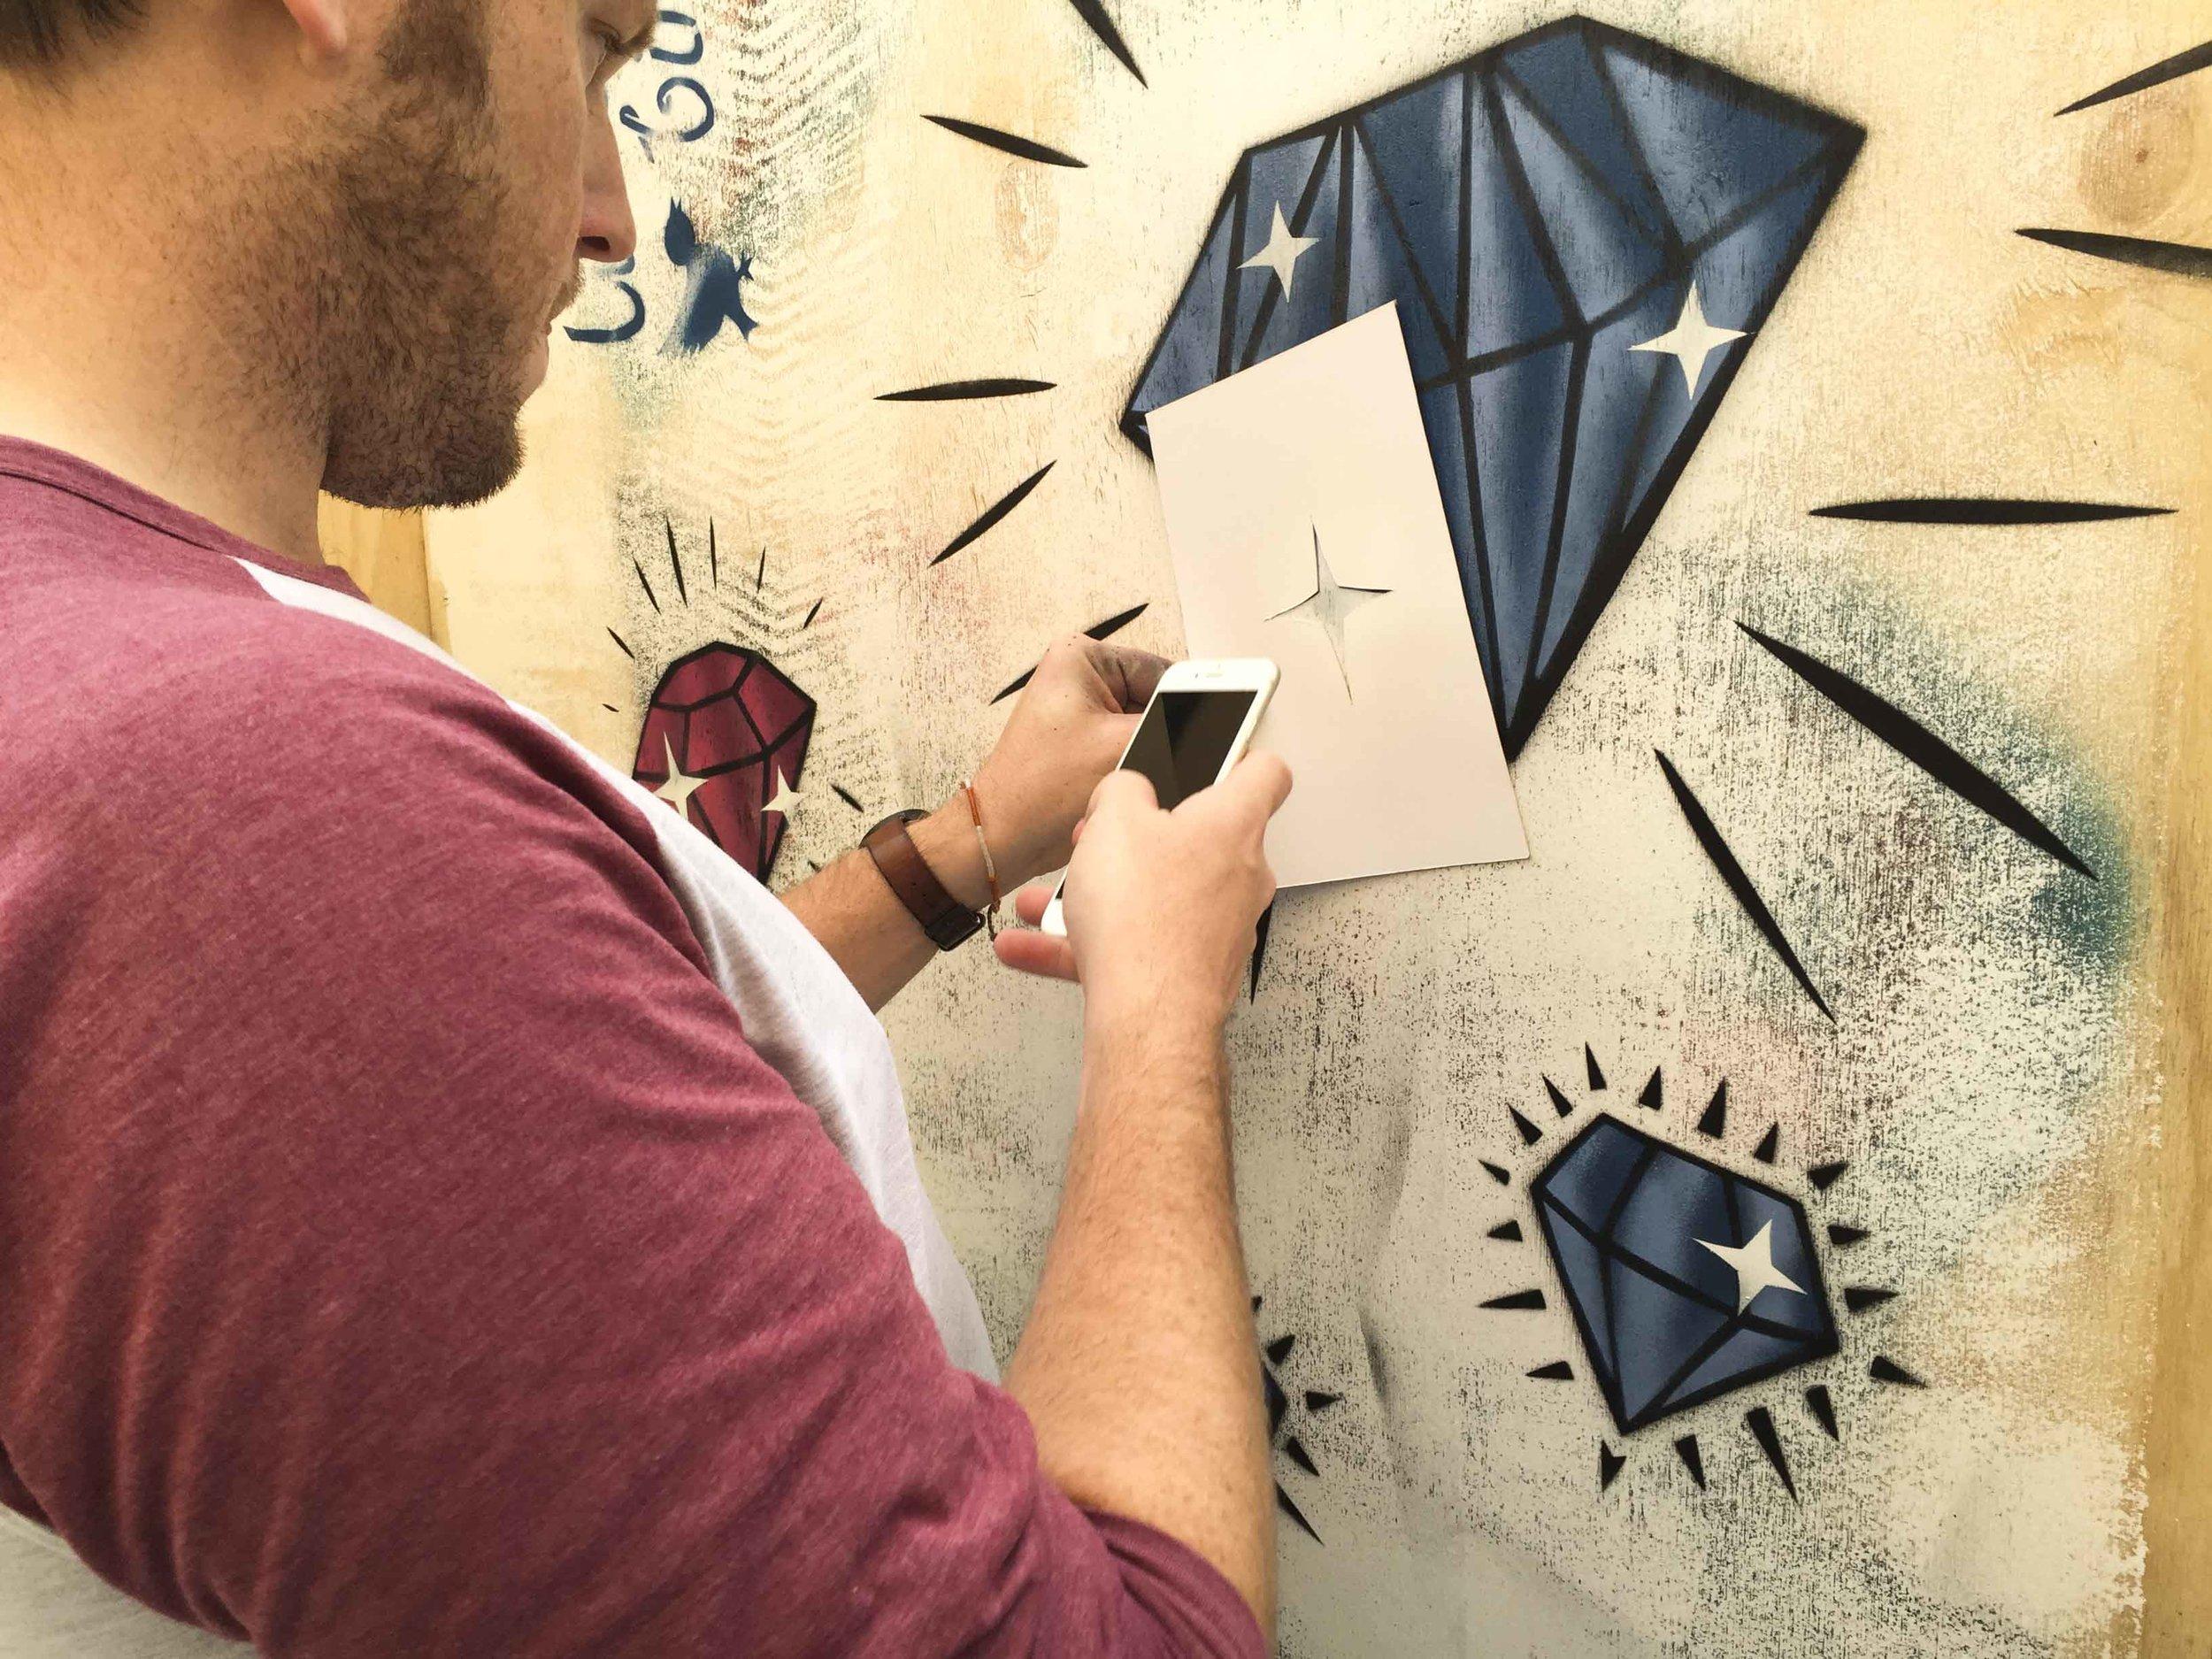 Tommo working on a stencil at Bendigo Street Festival